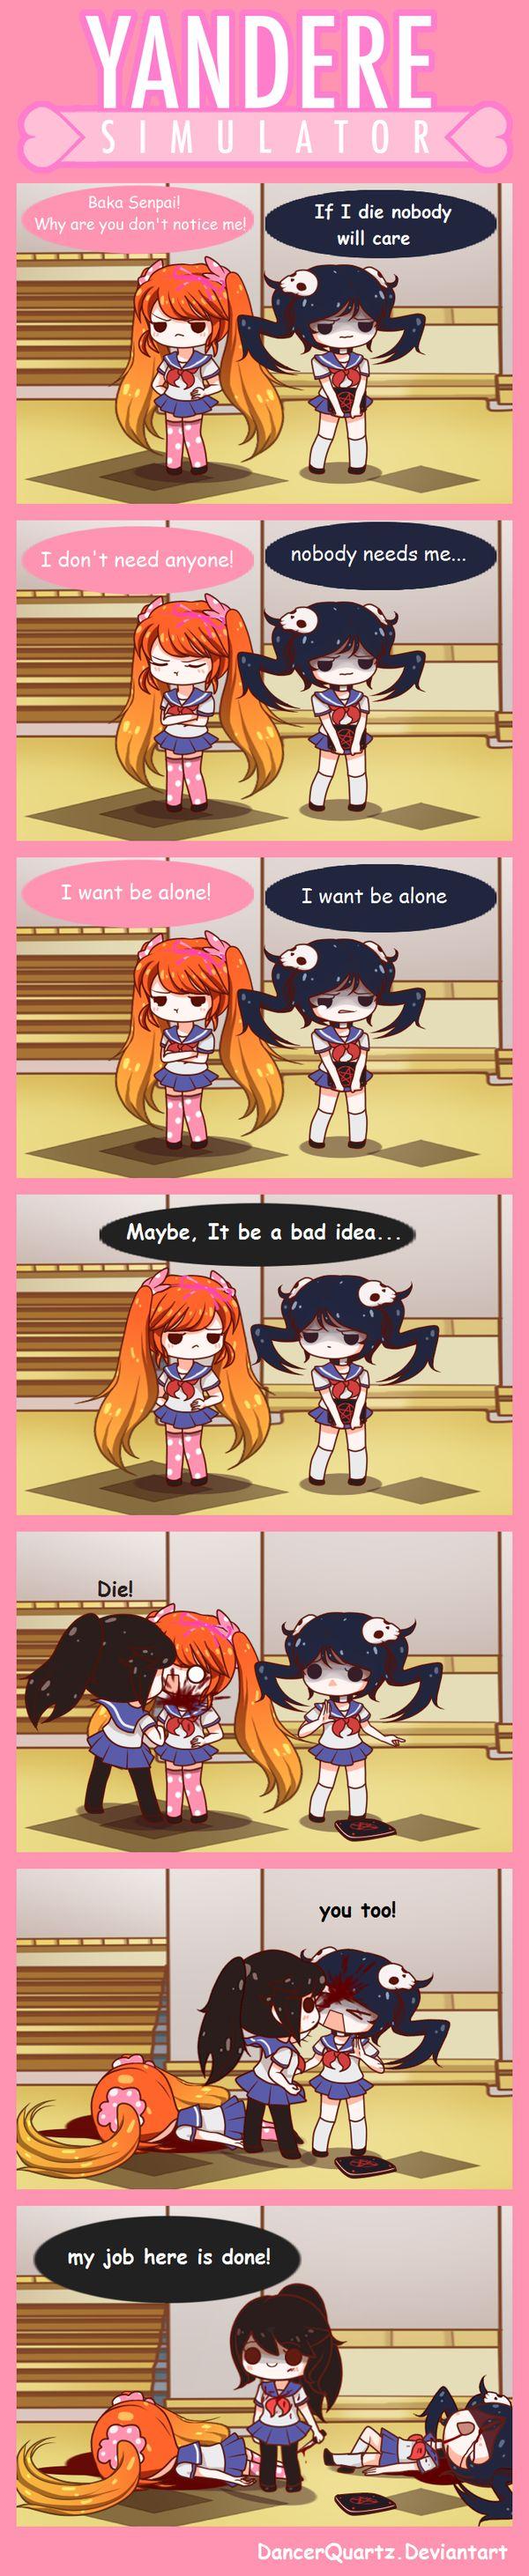 Yandere Comic - solution by DancerQuartz on DeviantArt